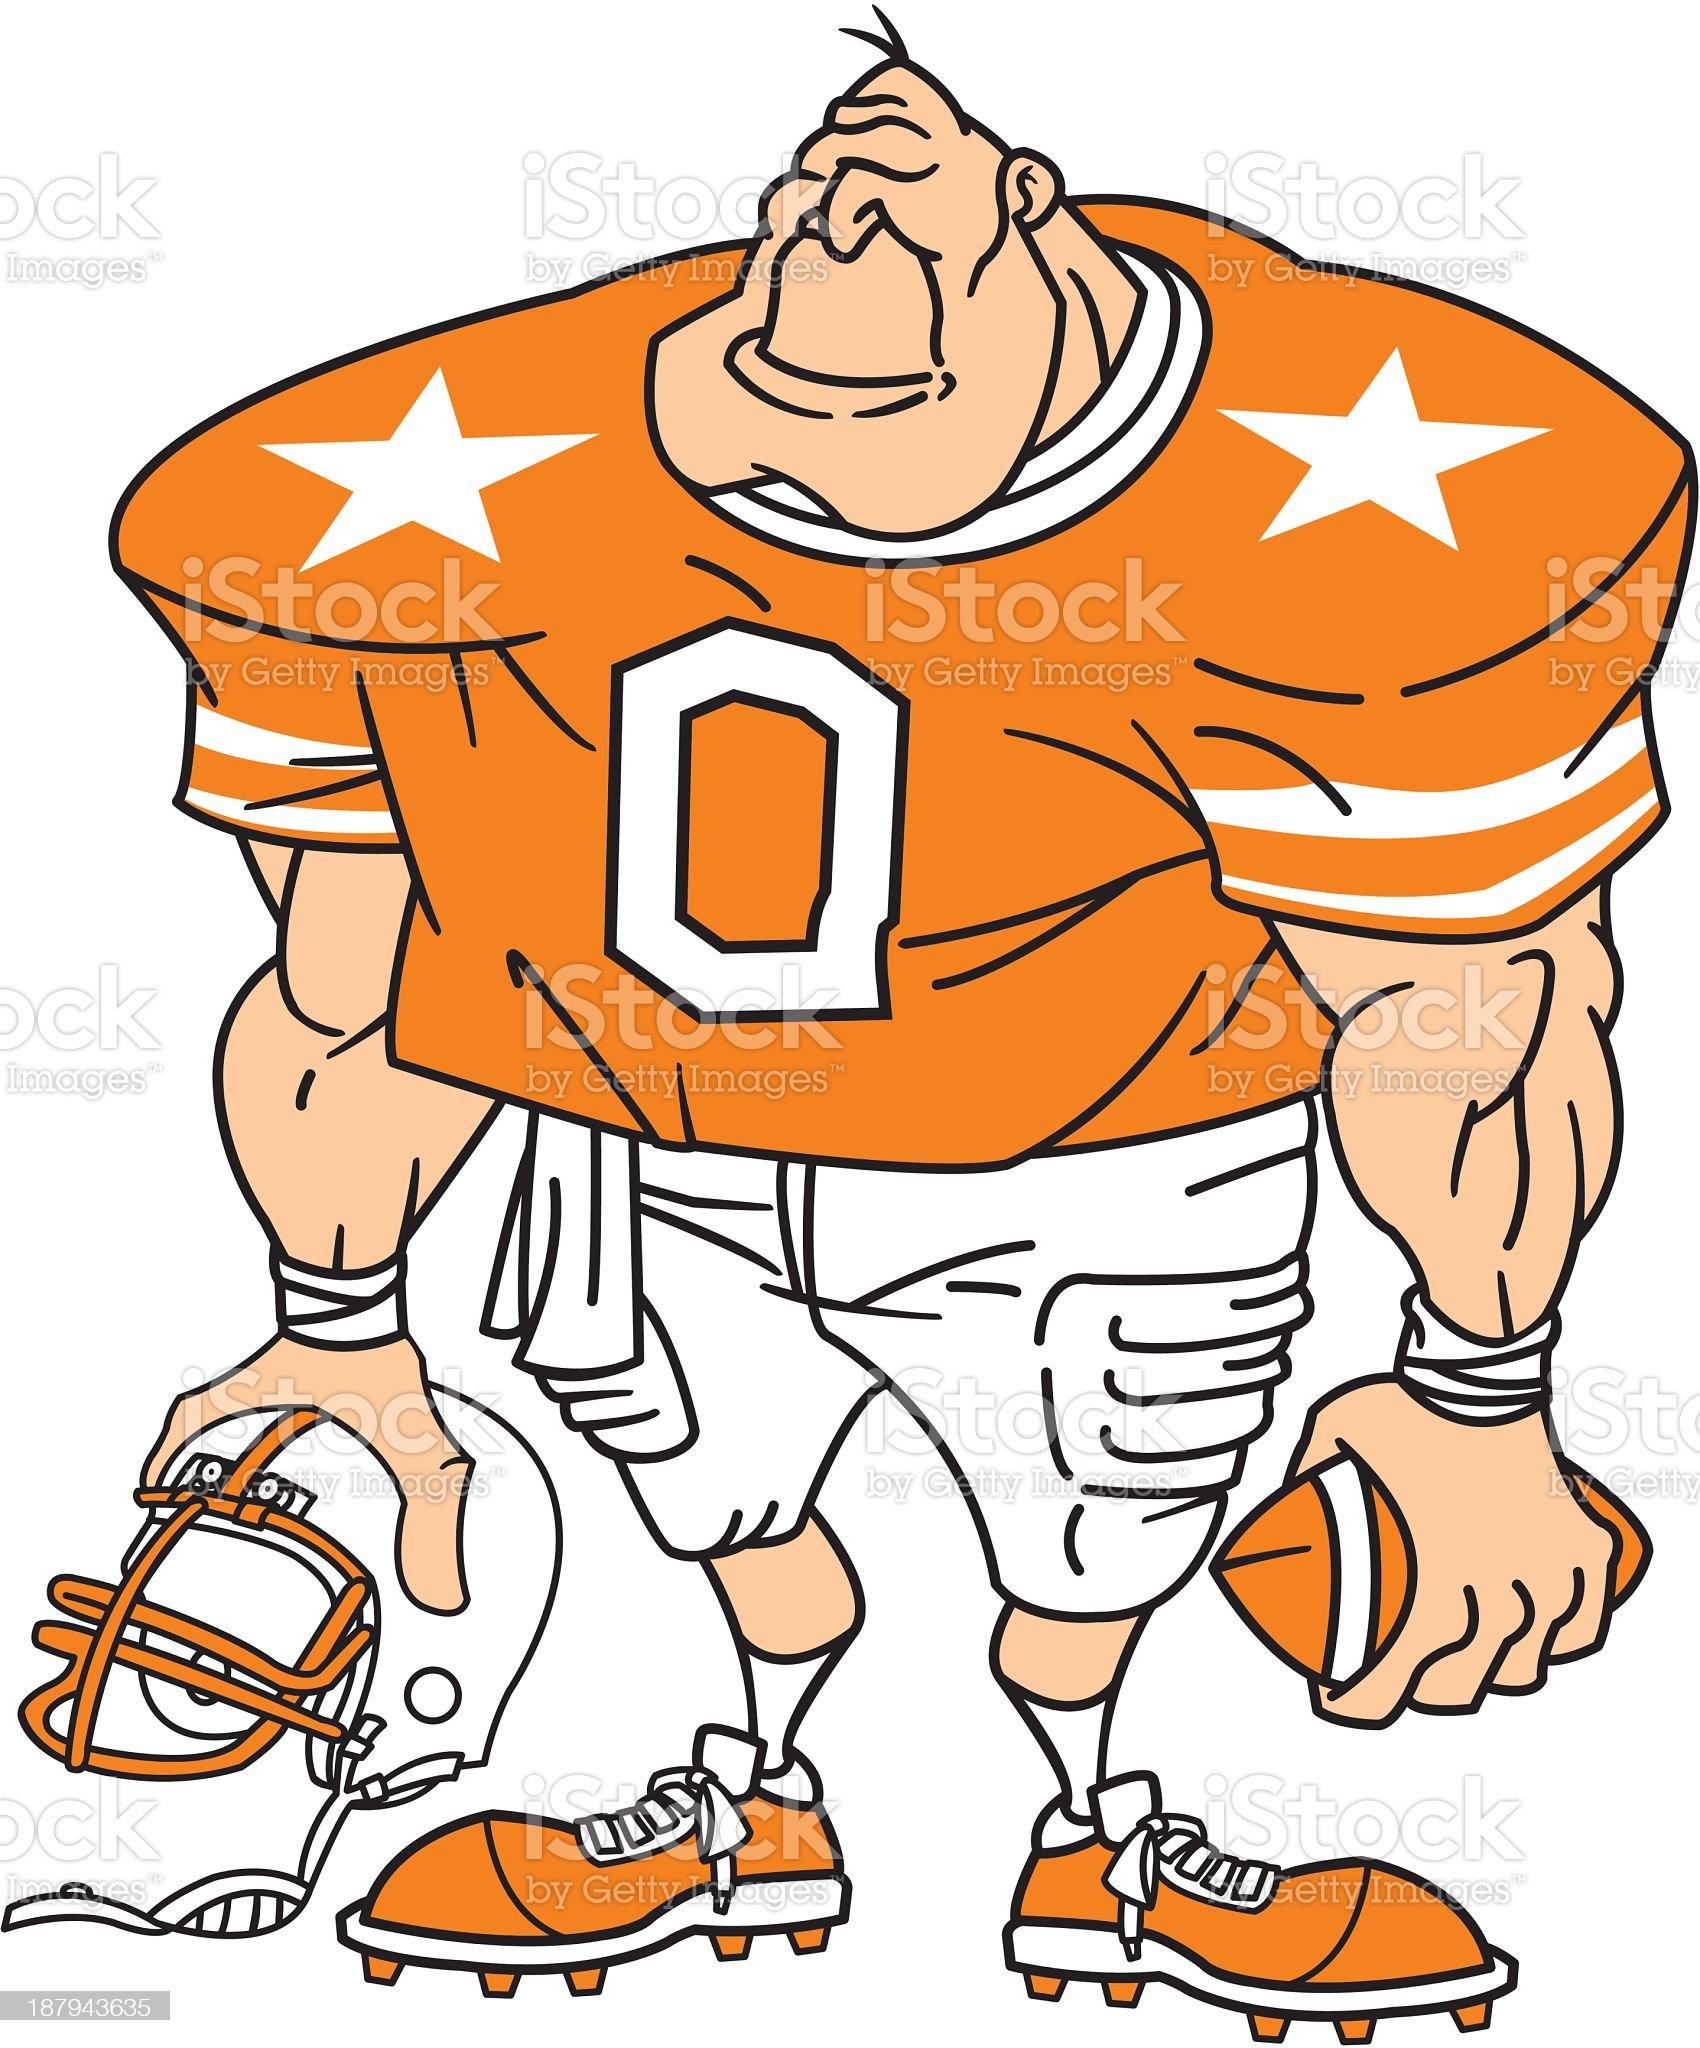 Football Player in Orange royalty-free stock vector art